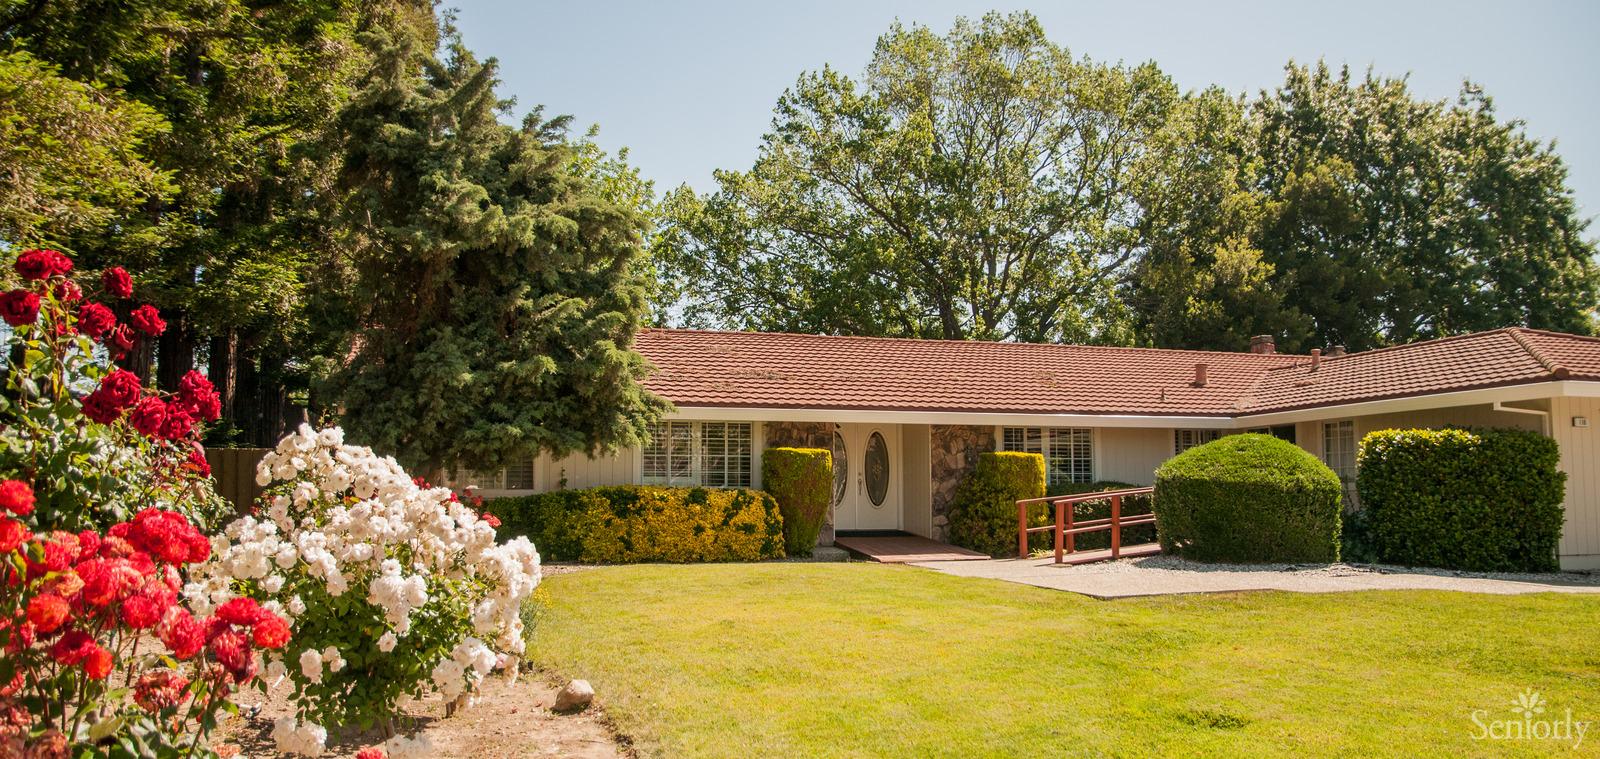 Abraham Rest Home (116 Via Monte) Walnut Creek CA 2